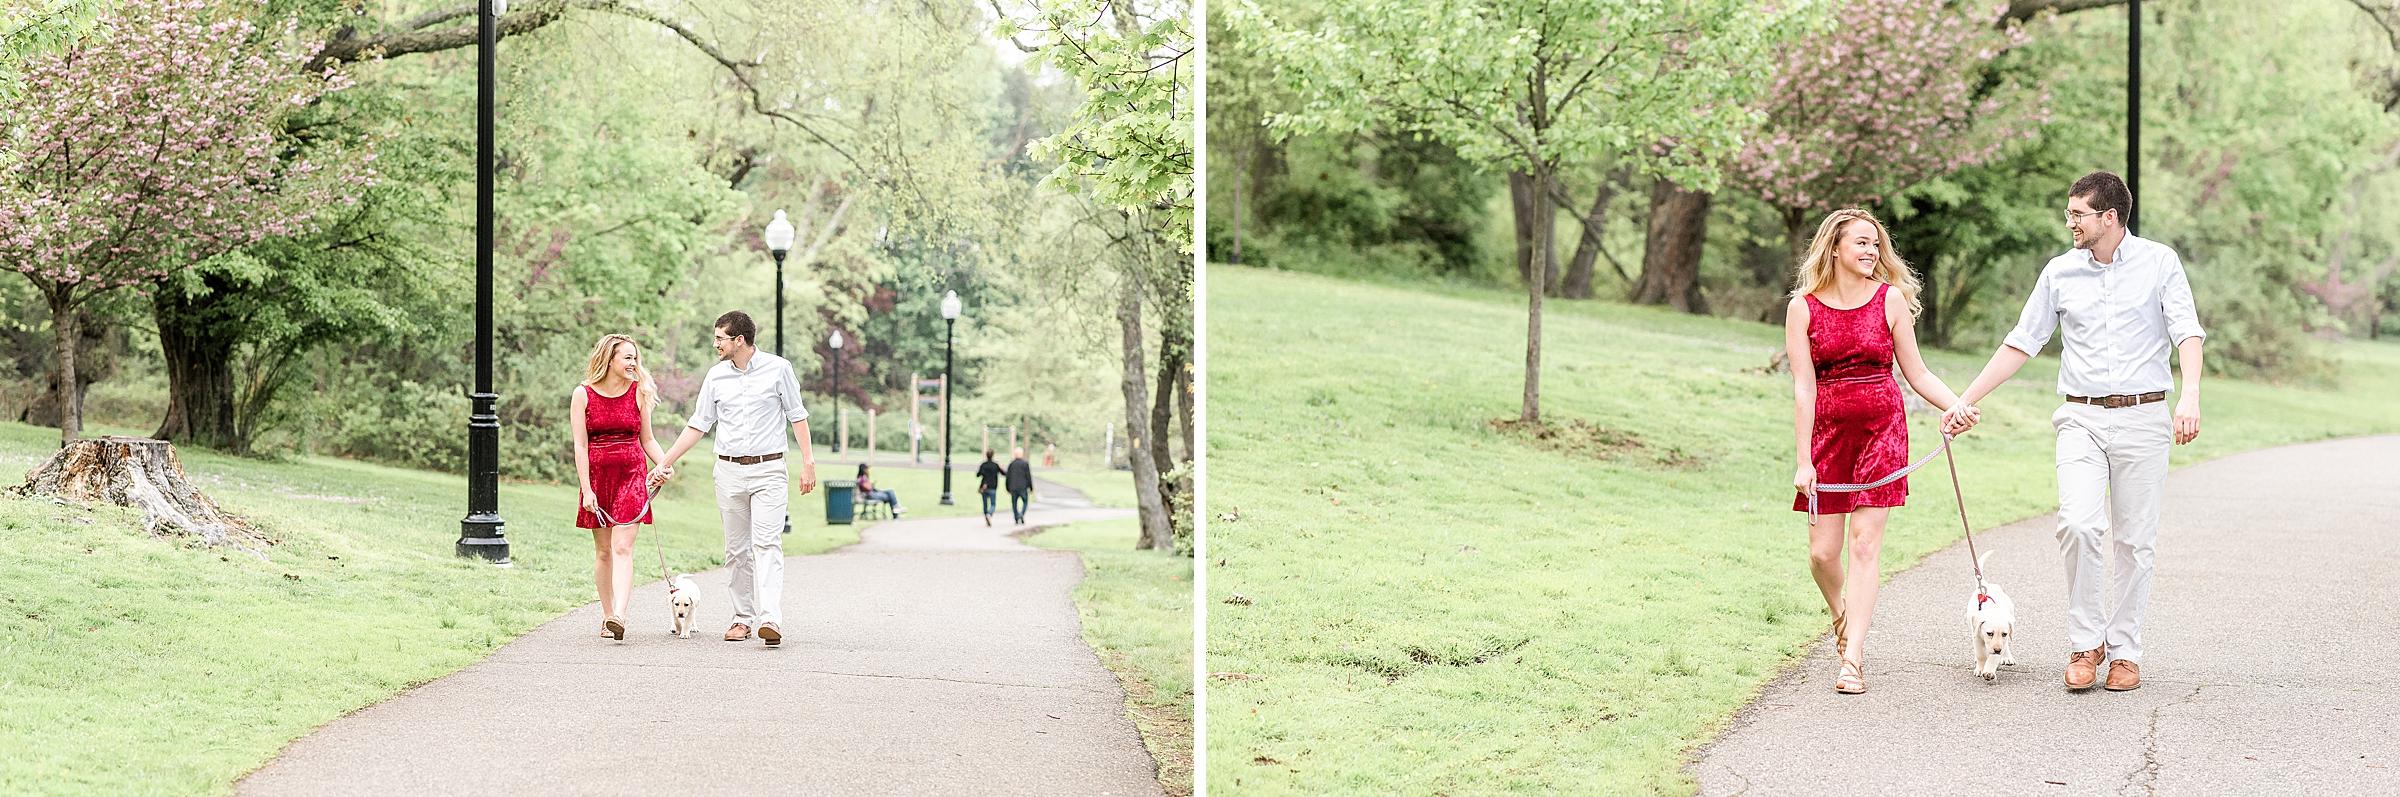 Couple walking their dog in Verona, NJ